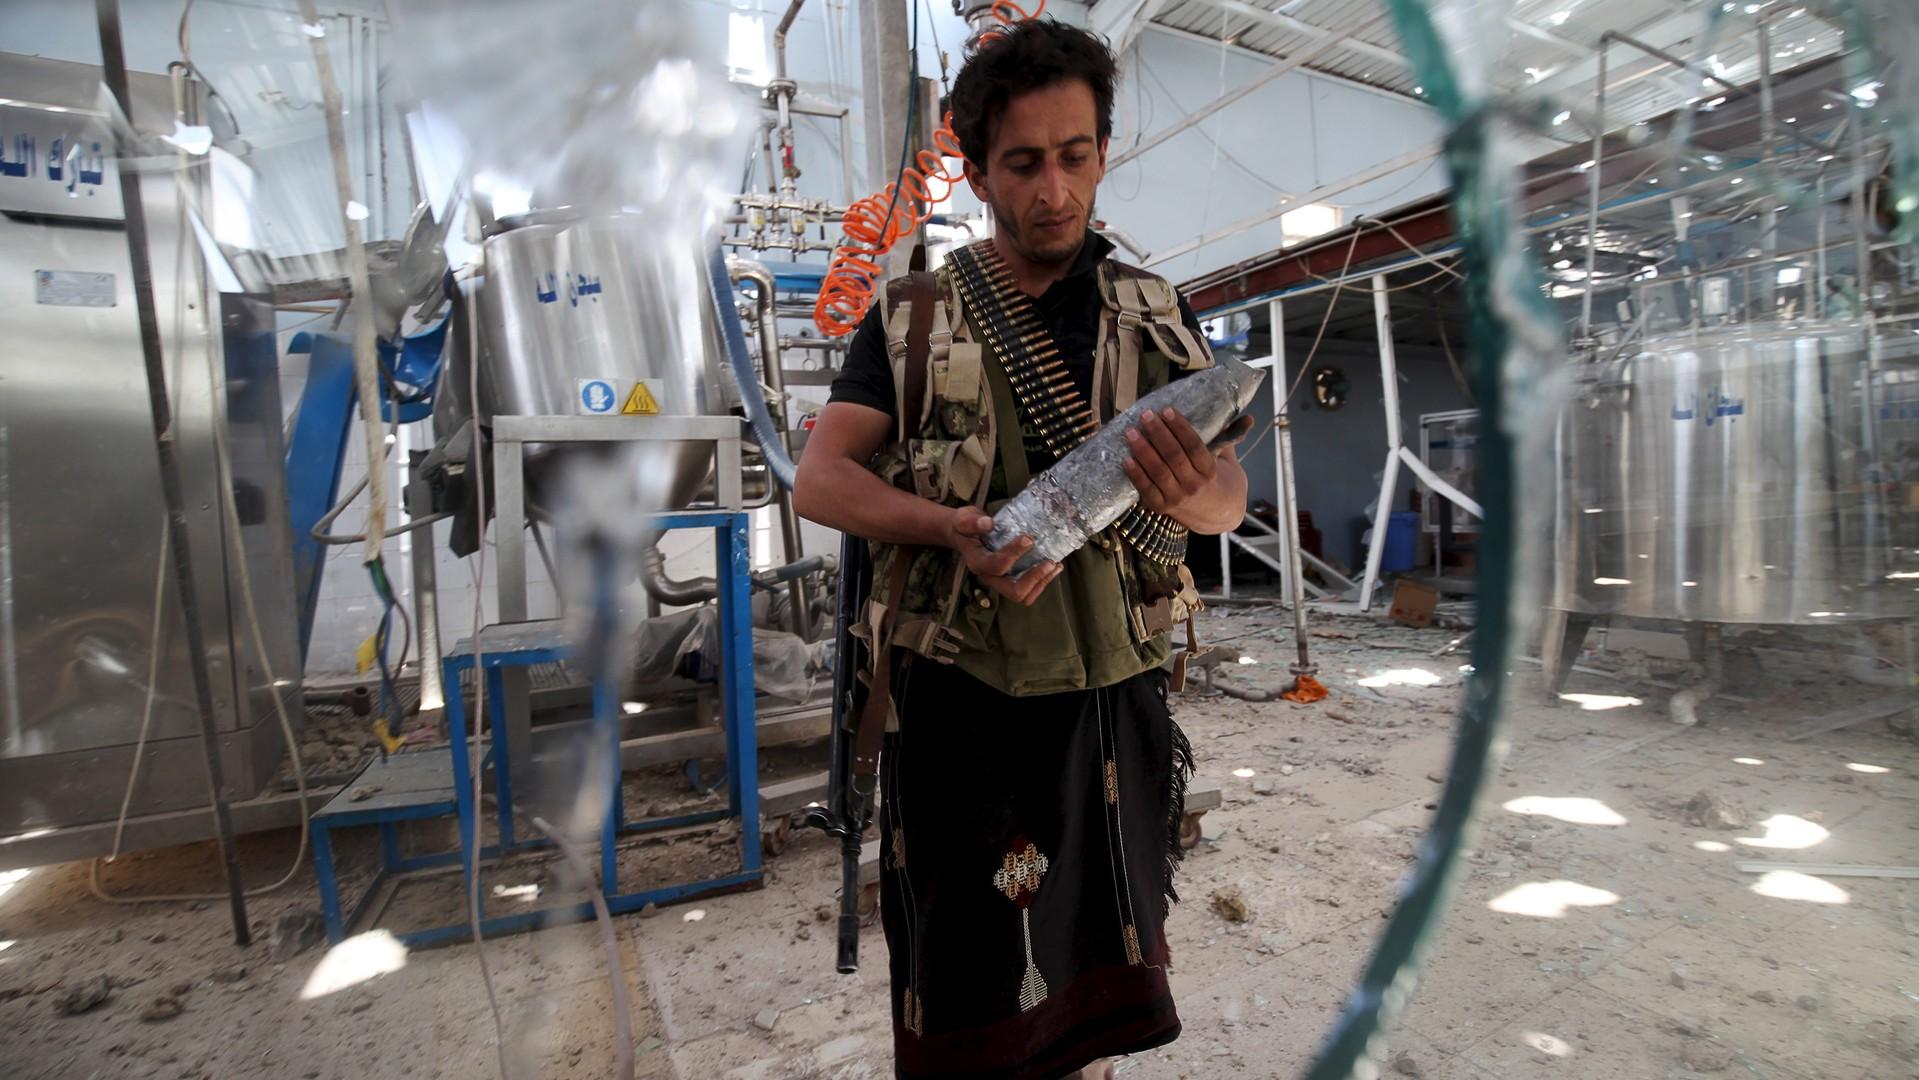 Un gardien regarde un obus d'artillerie dans une usine de Sanaa